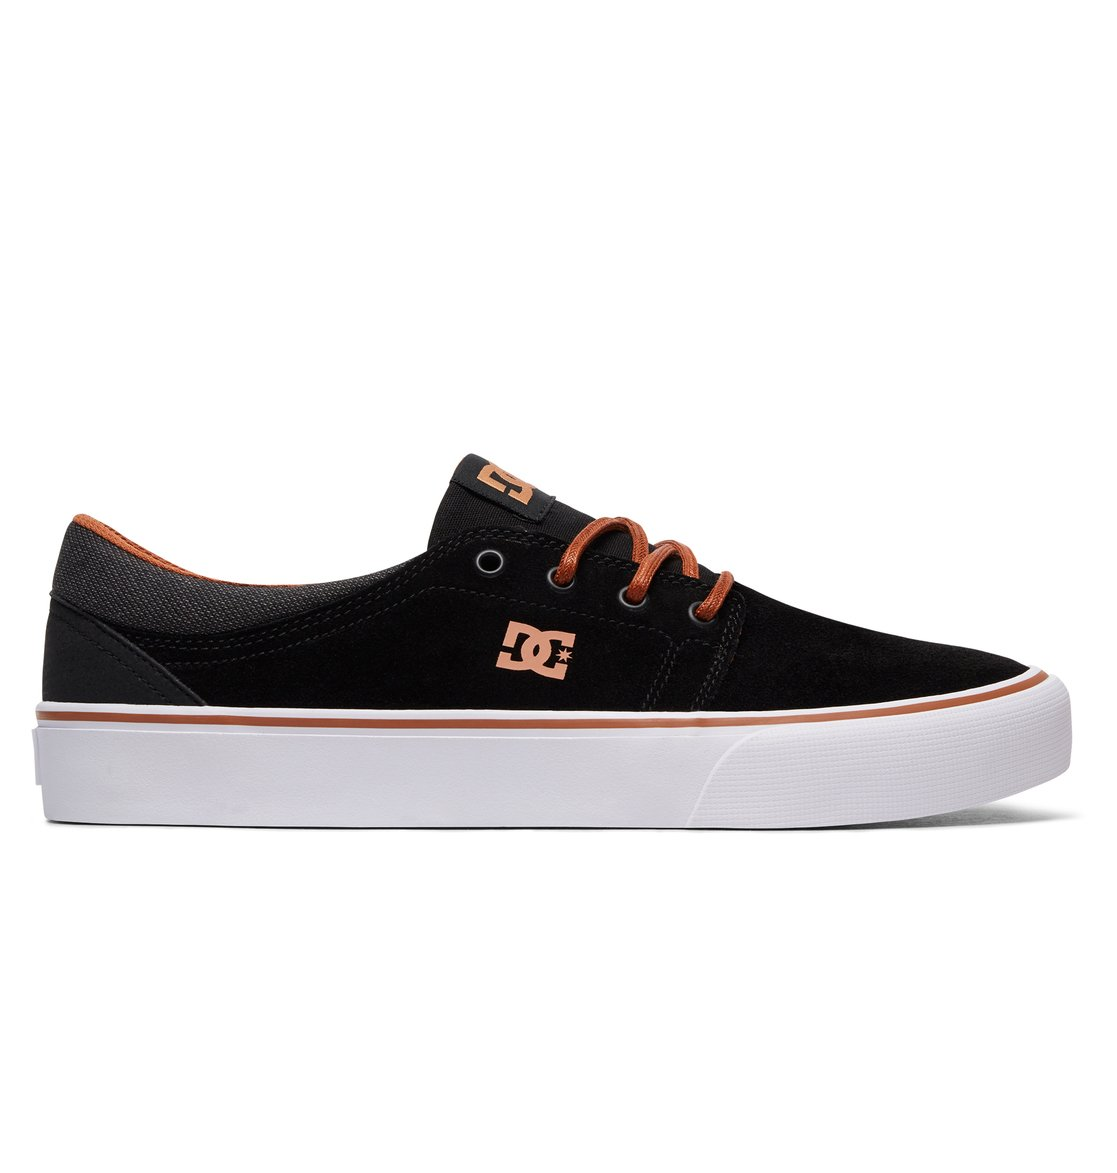 DC Shoes Trase SE - Shoes - Zapatos - Hombre - EU 44